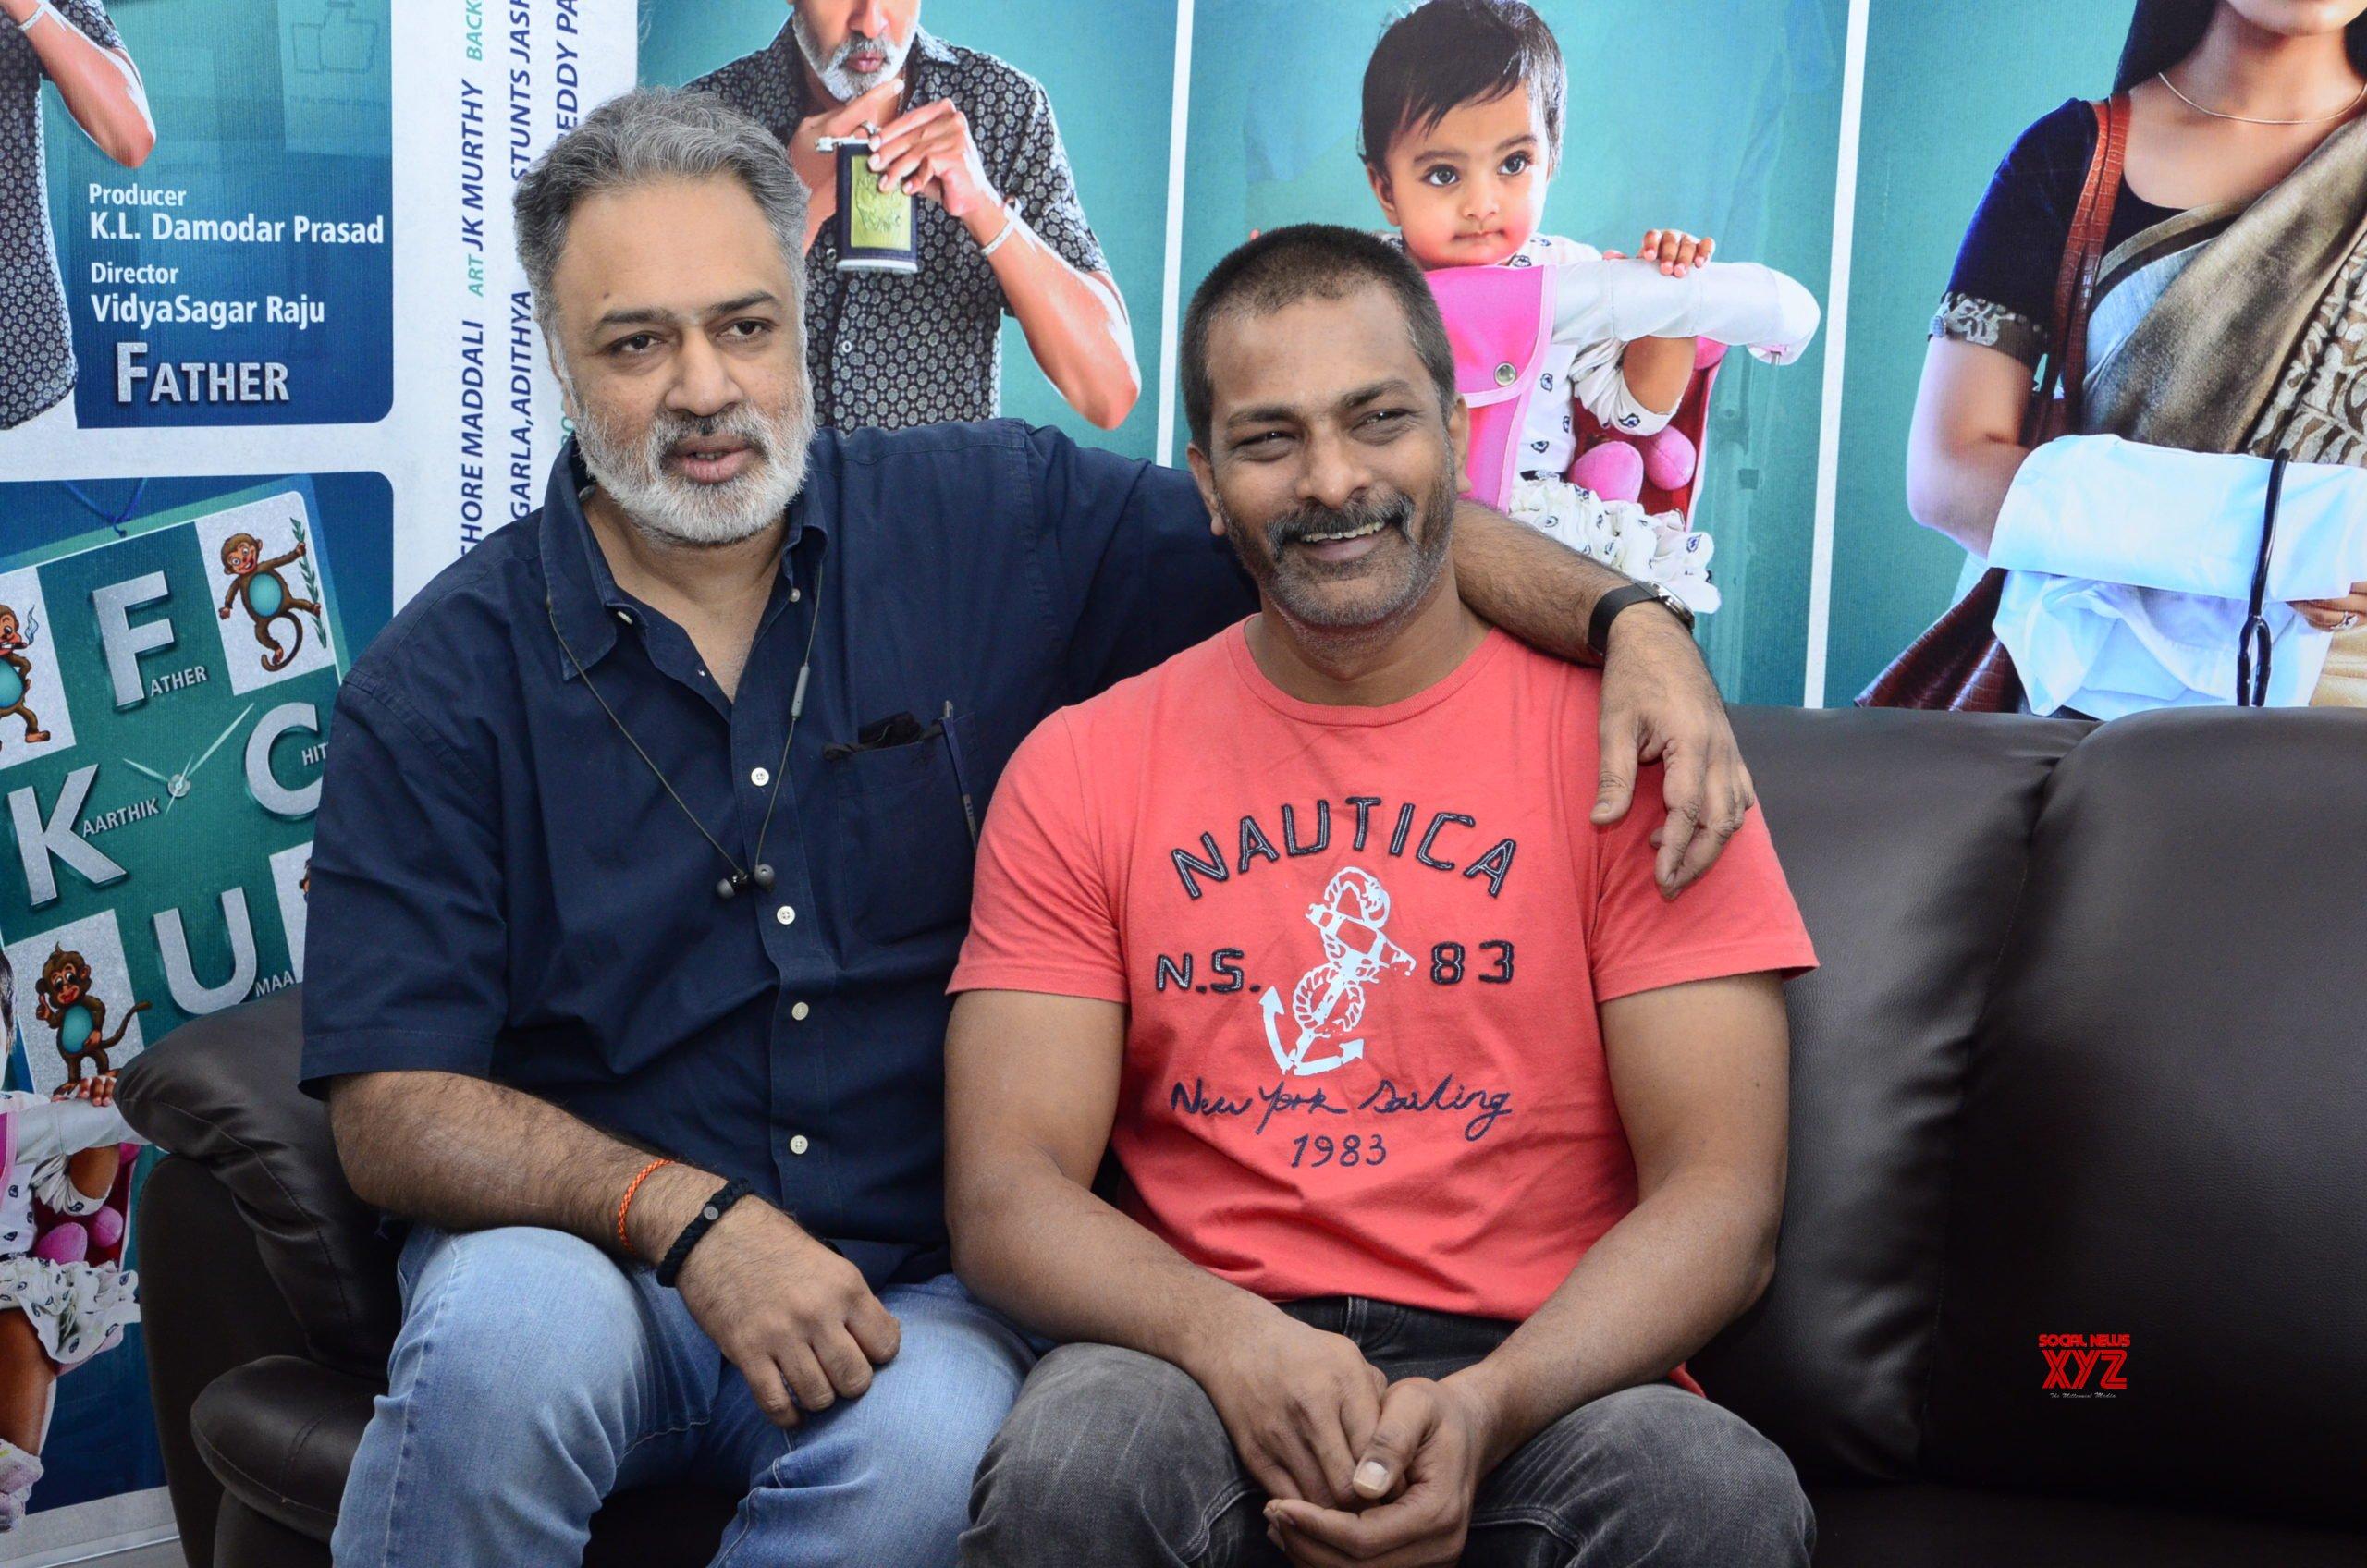 FCUK Father Chitti Uma Karthik Movie is a comic relief film: Director Vidyasagar Raju